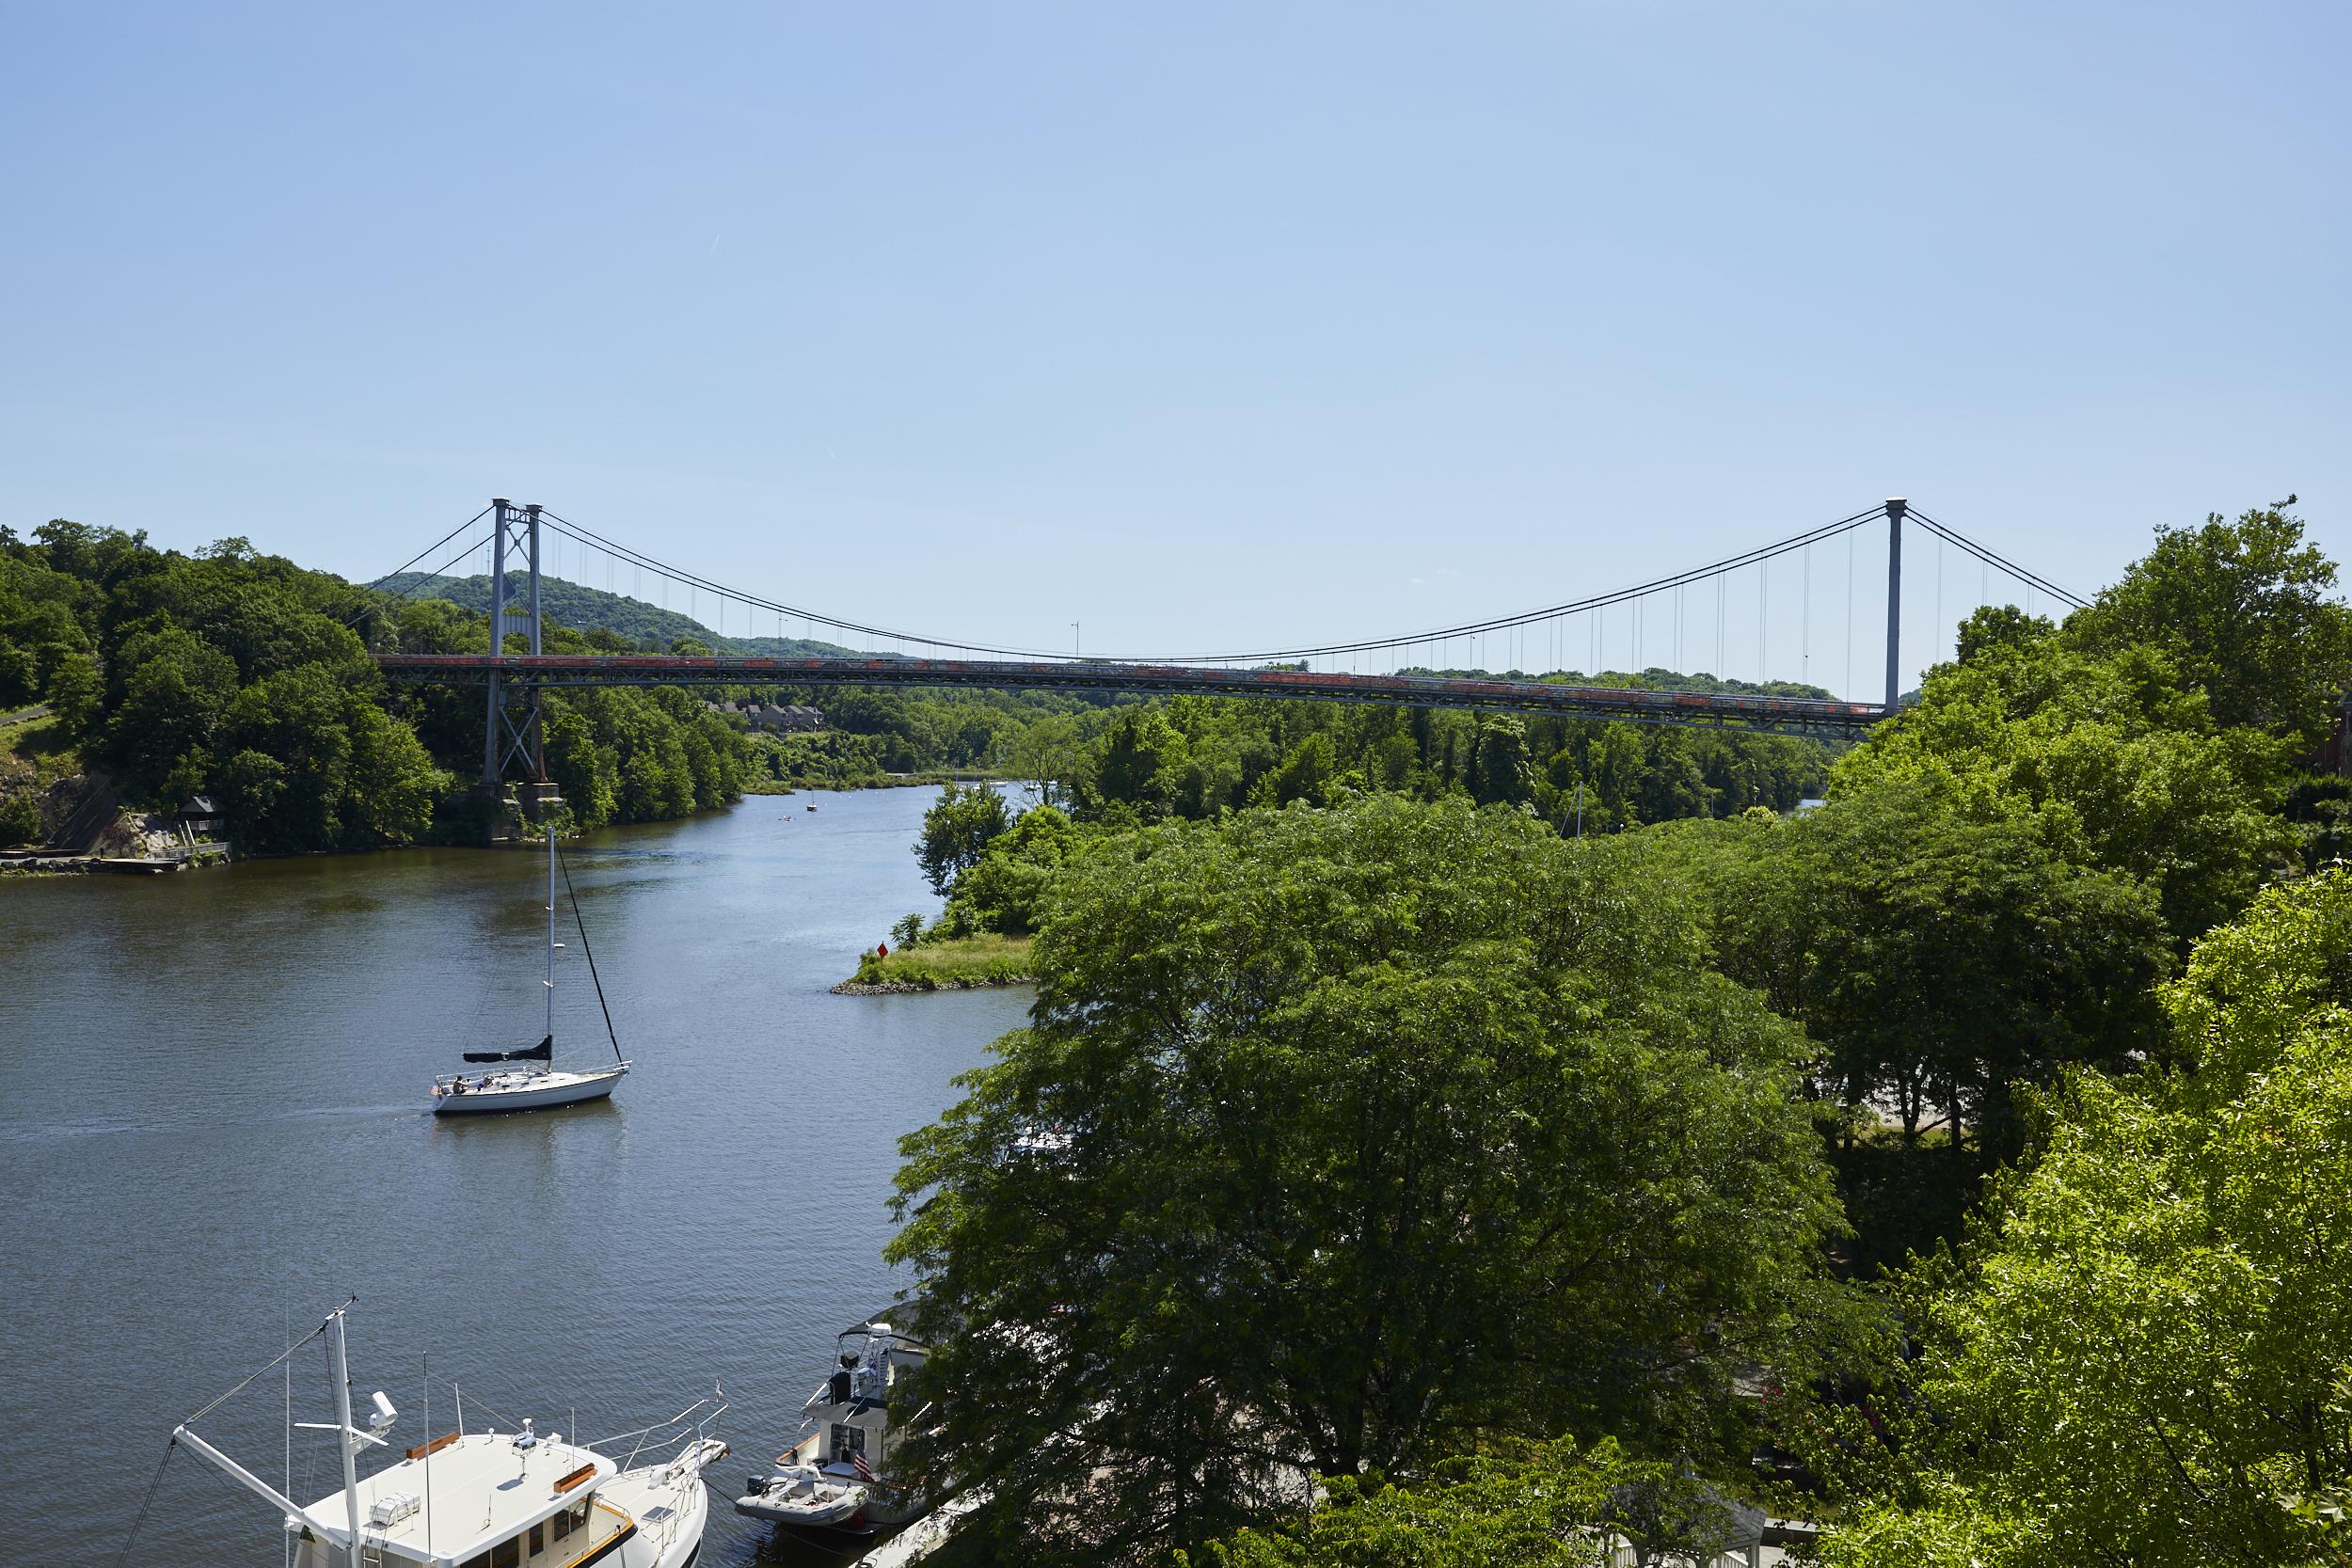 Rondout Creek Bridge, Kingston, New York.Johnny Fogg